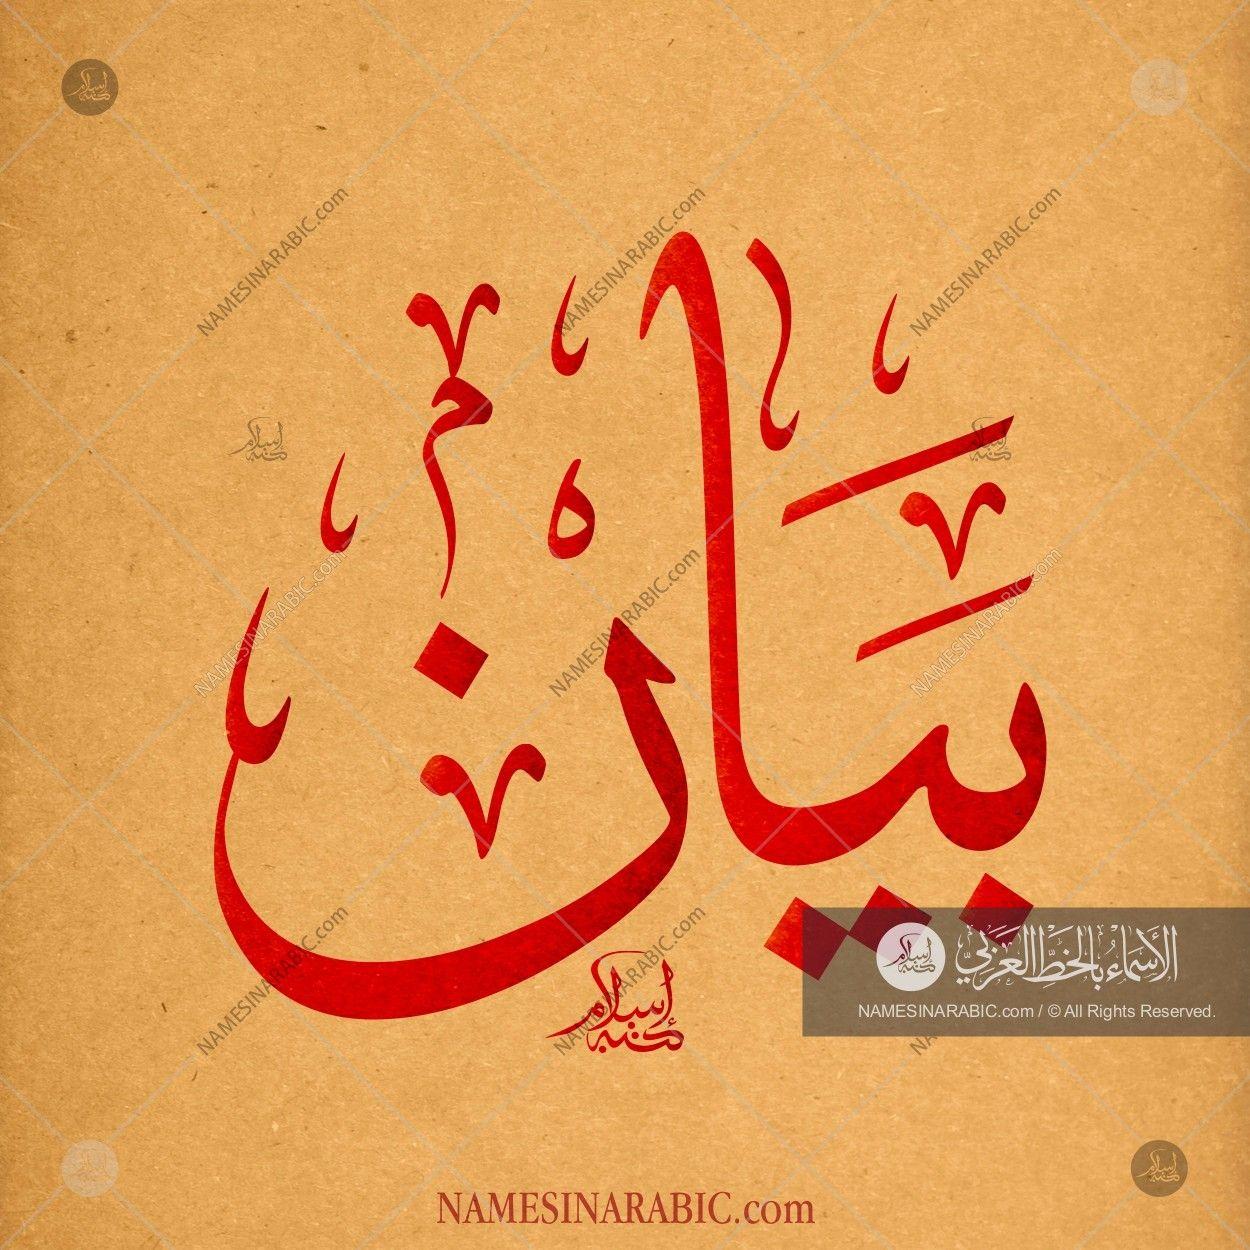 Bayan بيان Names In Arabic Calligraphy Name 1563 Calligraphy Name Islamic Calligraphy Arabic Calligraphy Art